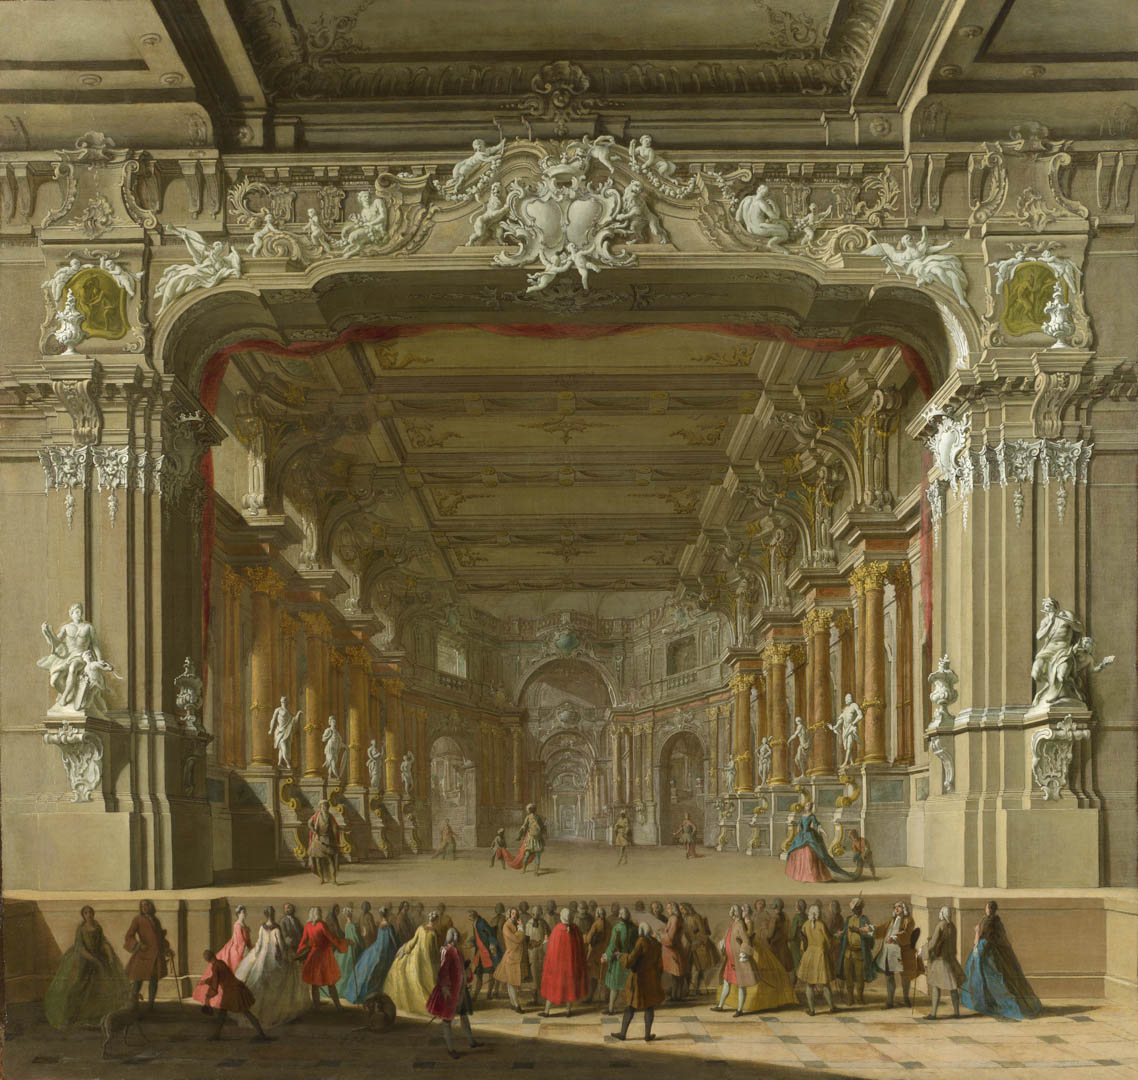 Of A Theatre Italian Renaissance Northern Art Wallpaper 1138x1080